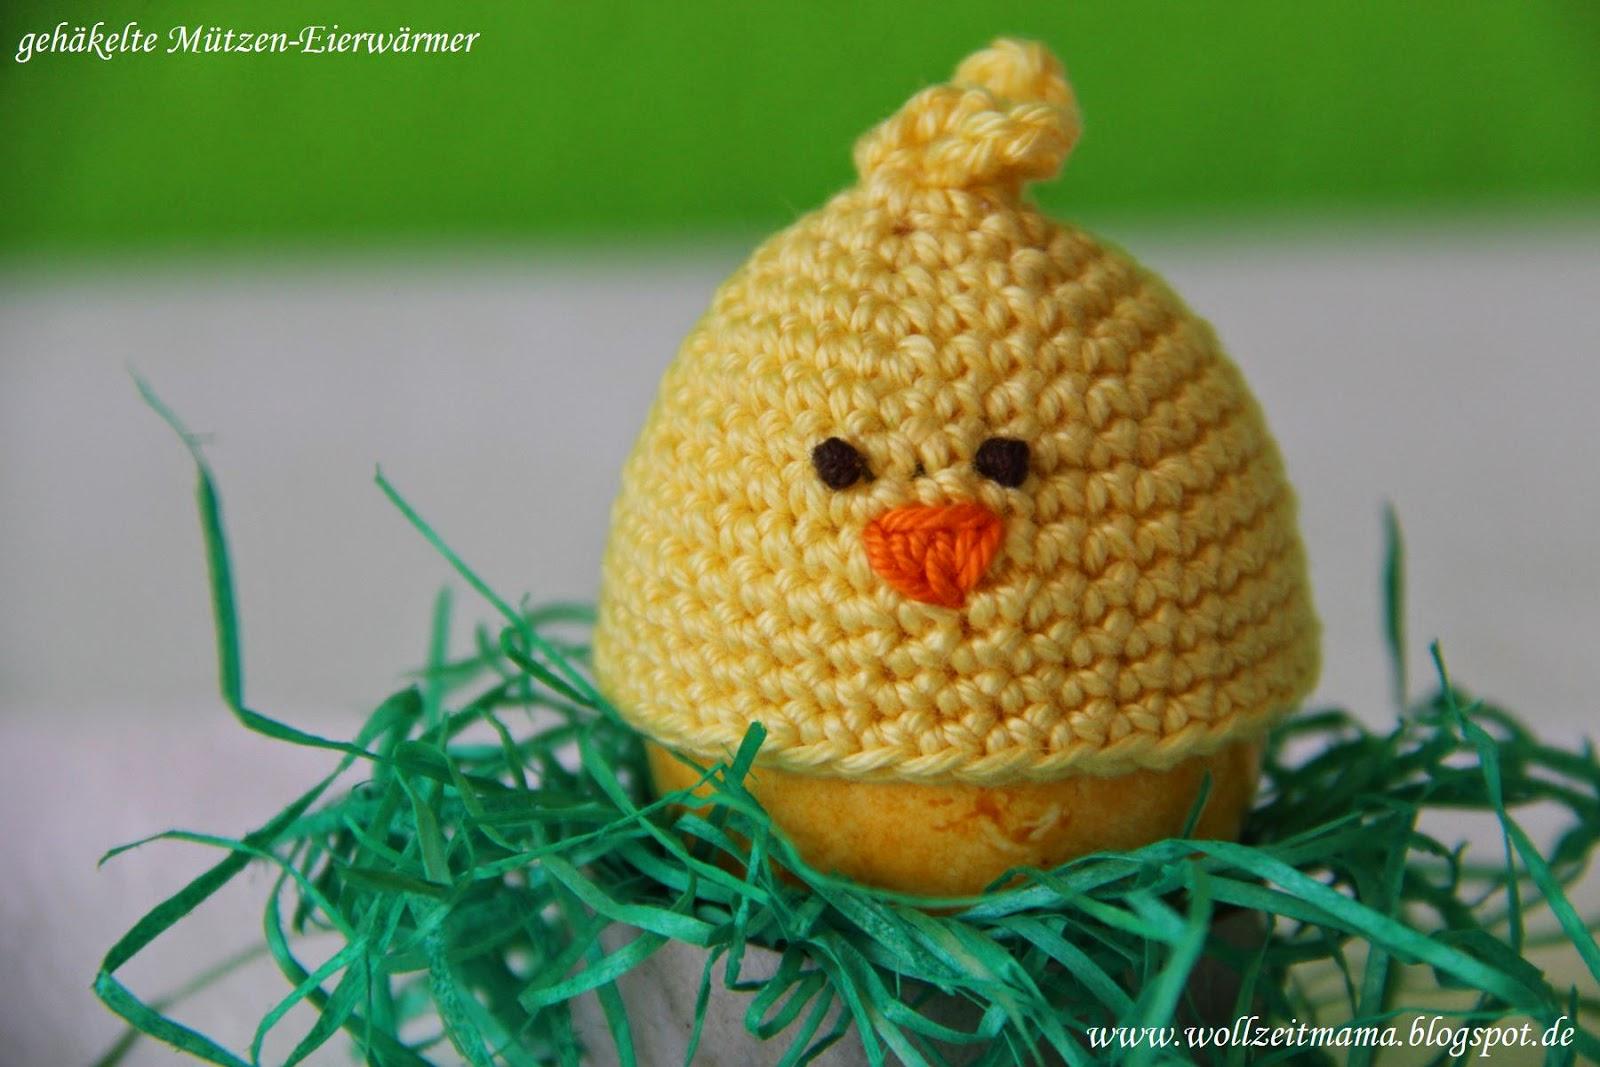 Wollzeitmama Gehäkelte Mützen Eierwärmer